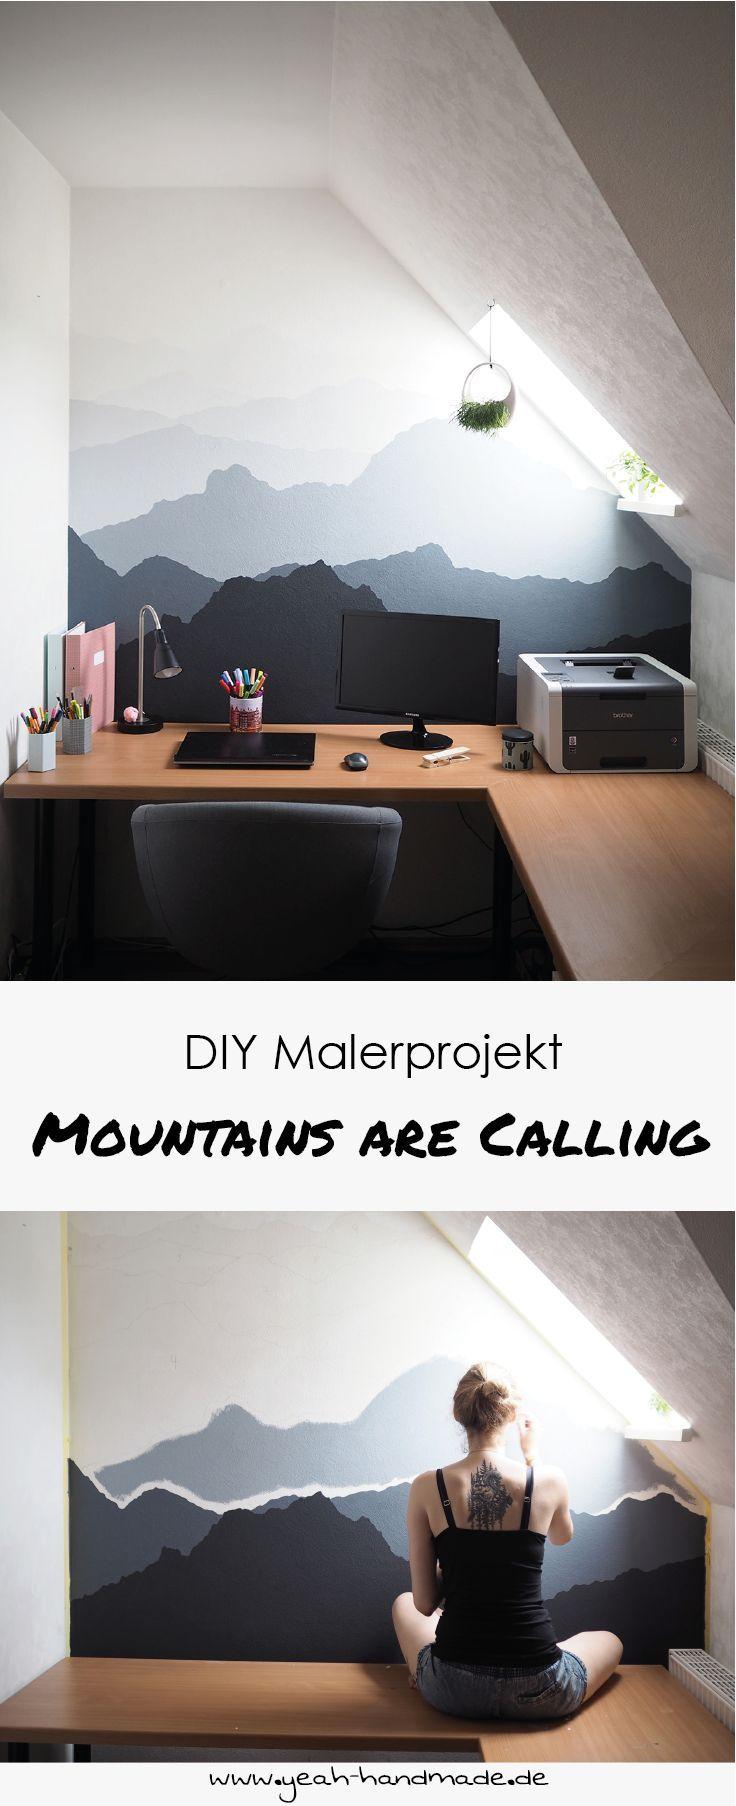 Diy malerprojekt mountains are calling diy home for Kreative zimmereinrichtung